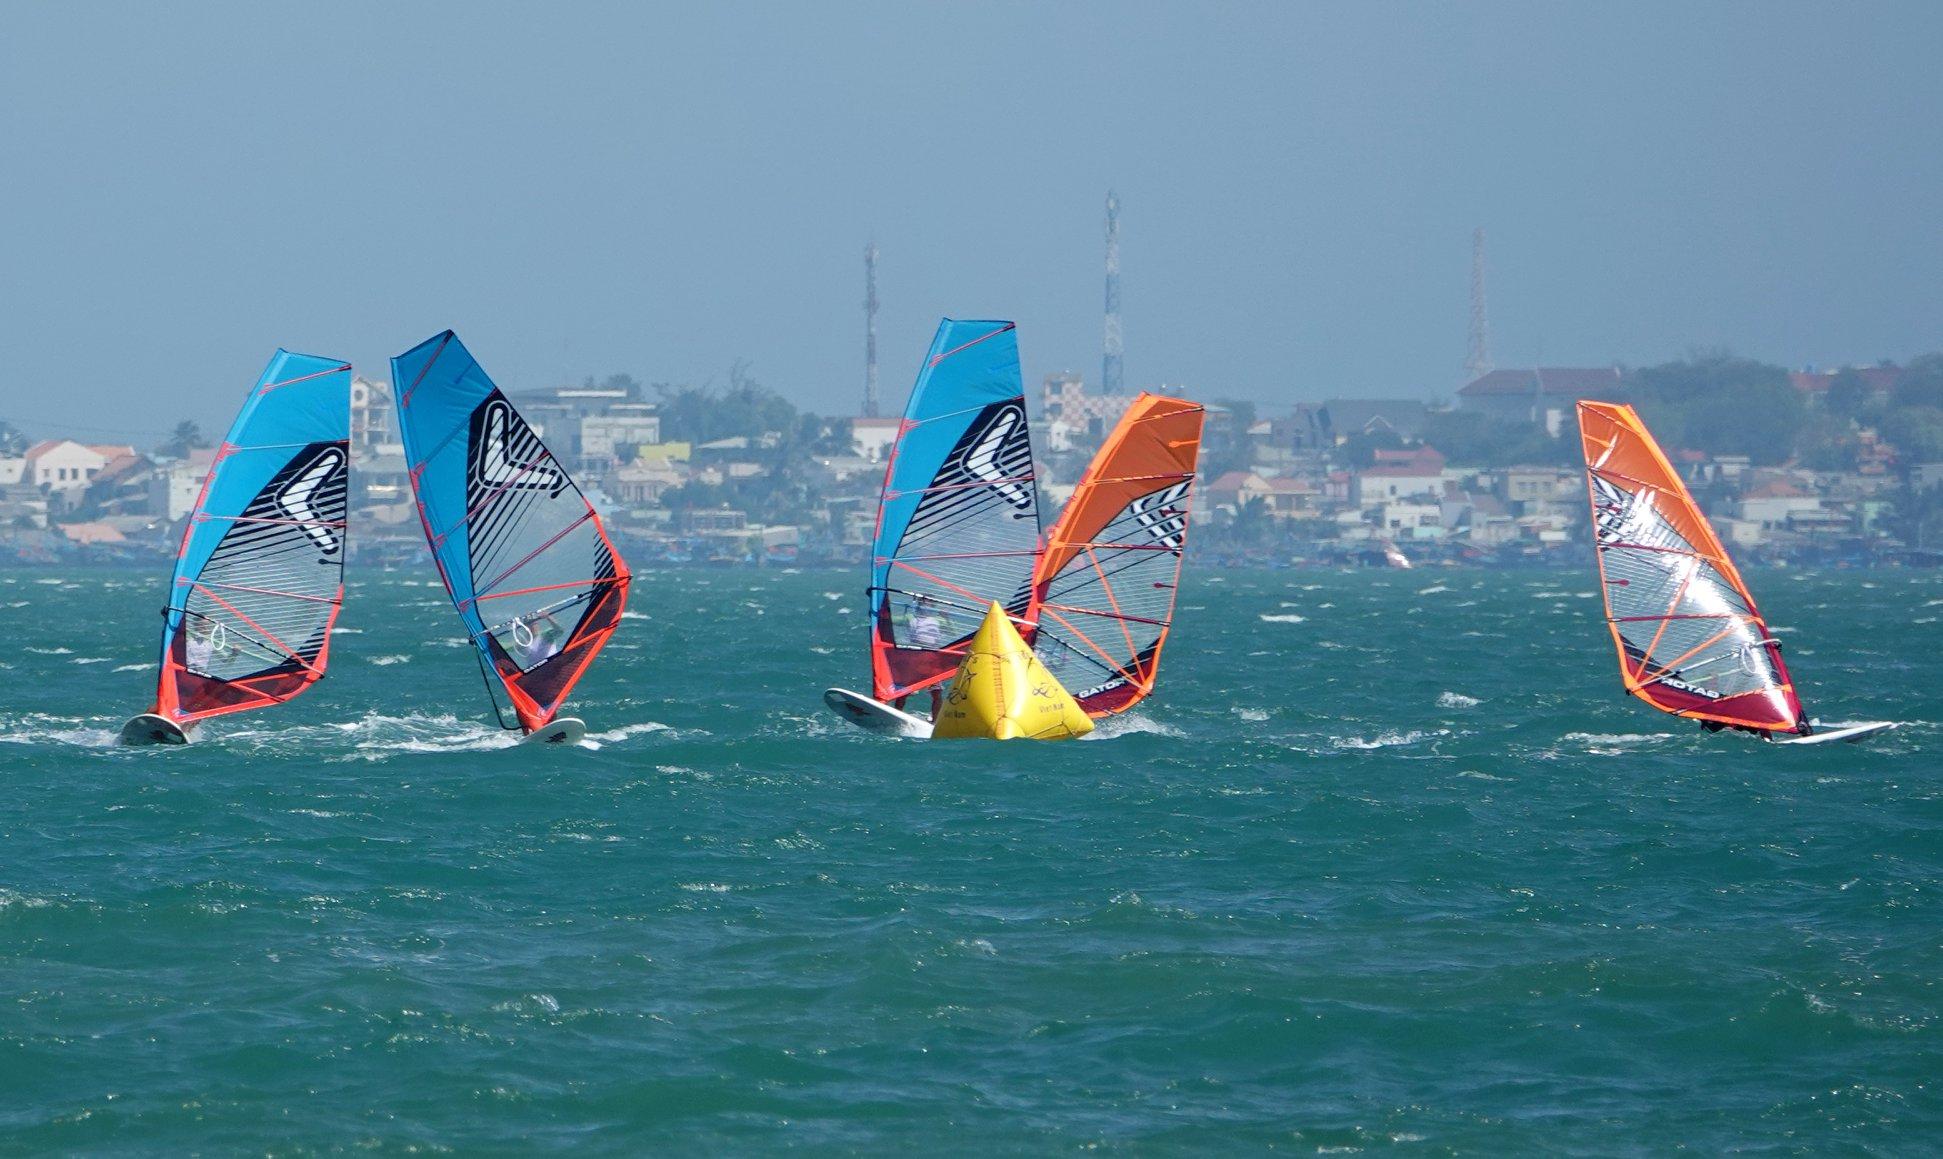 The Very First Windsurf Center In Vietnam Since 2000